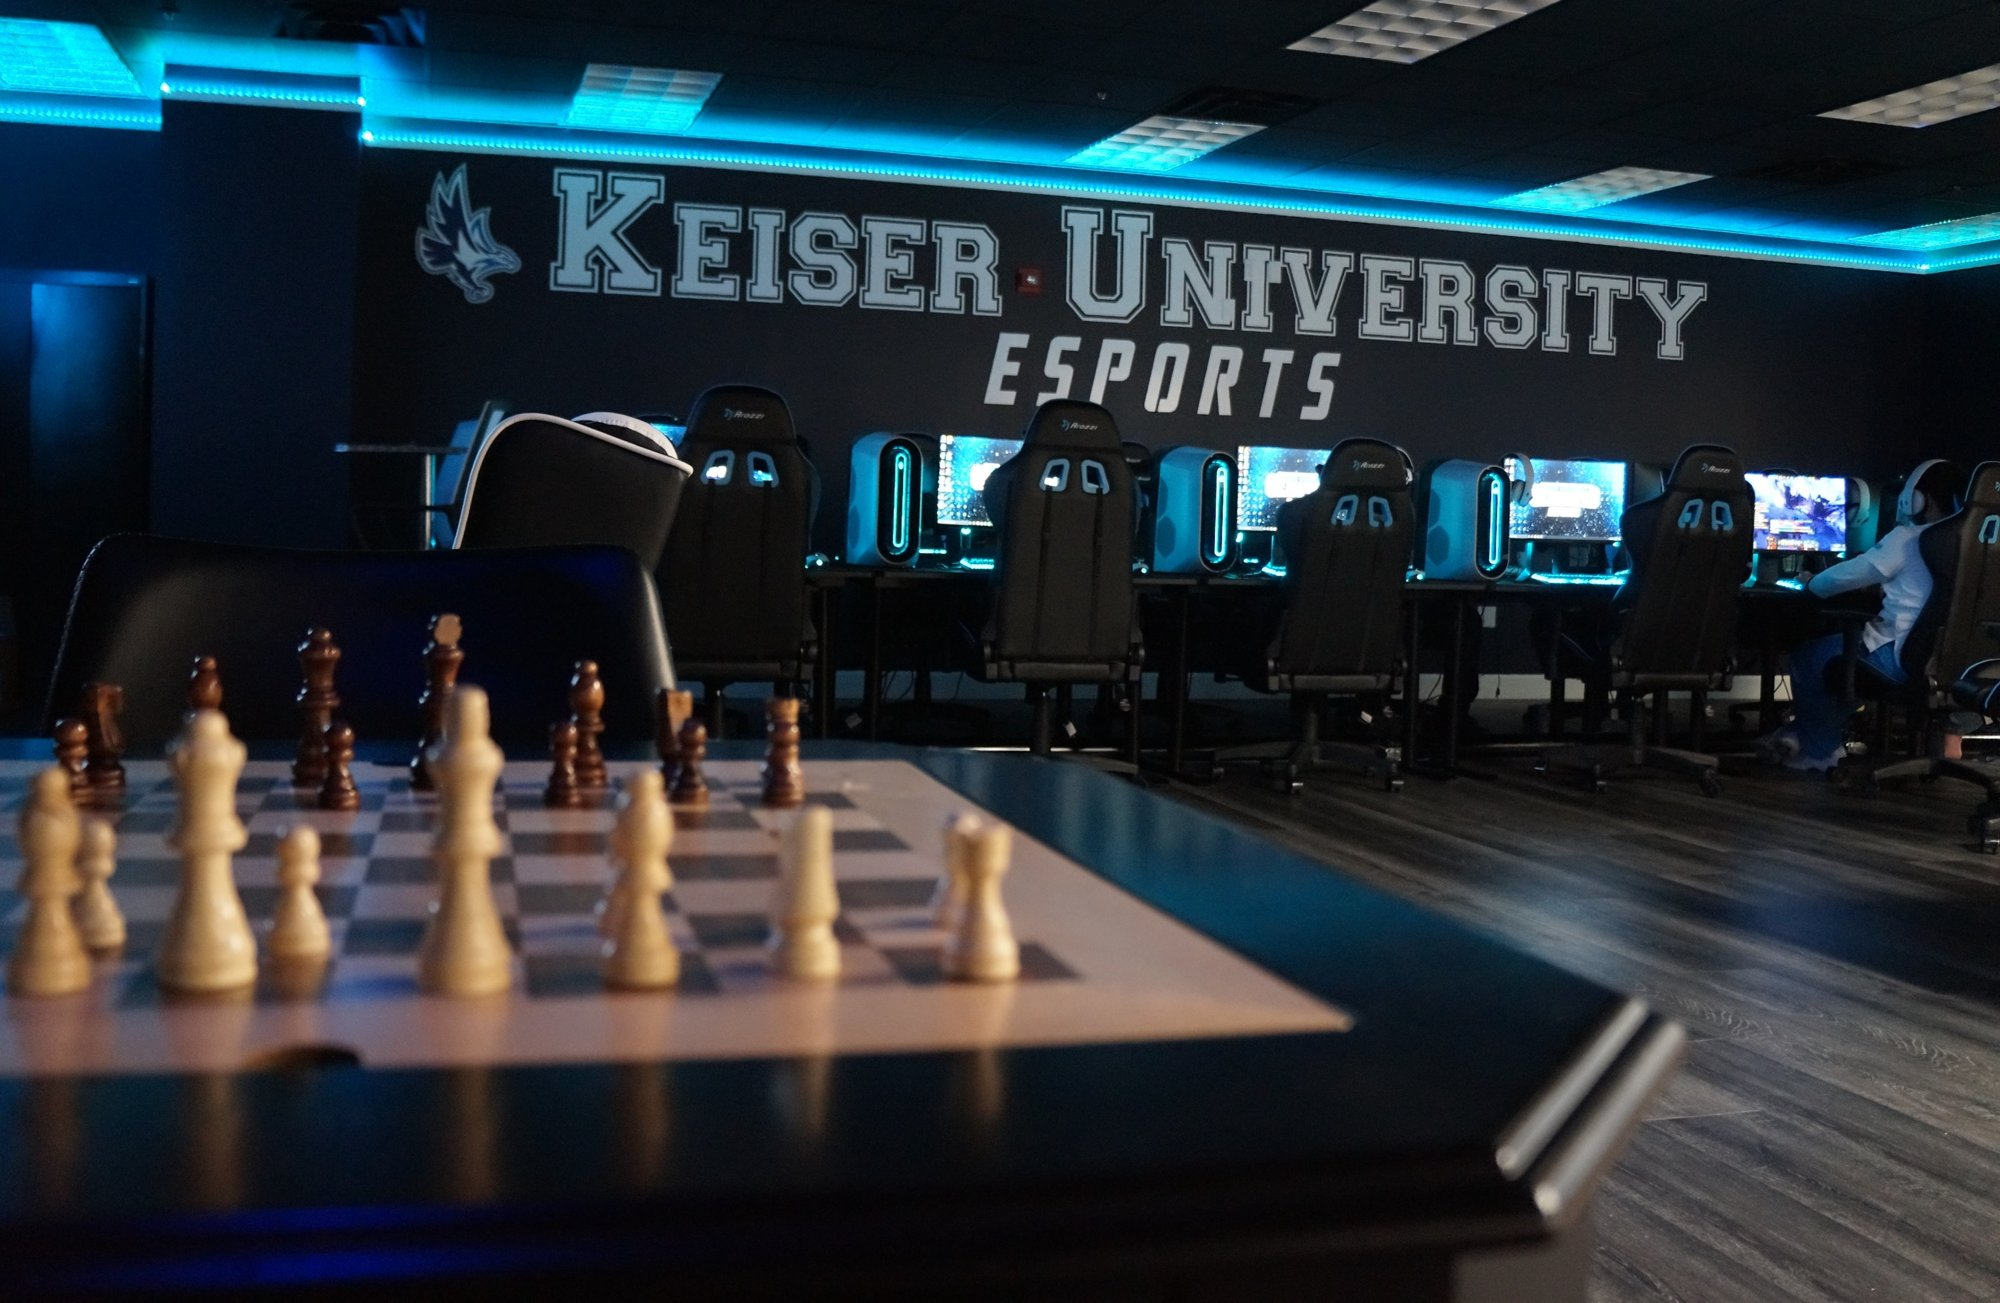 Keiser University Esports Program Highlighted by Business Observer Newspaper